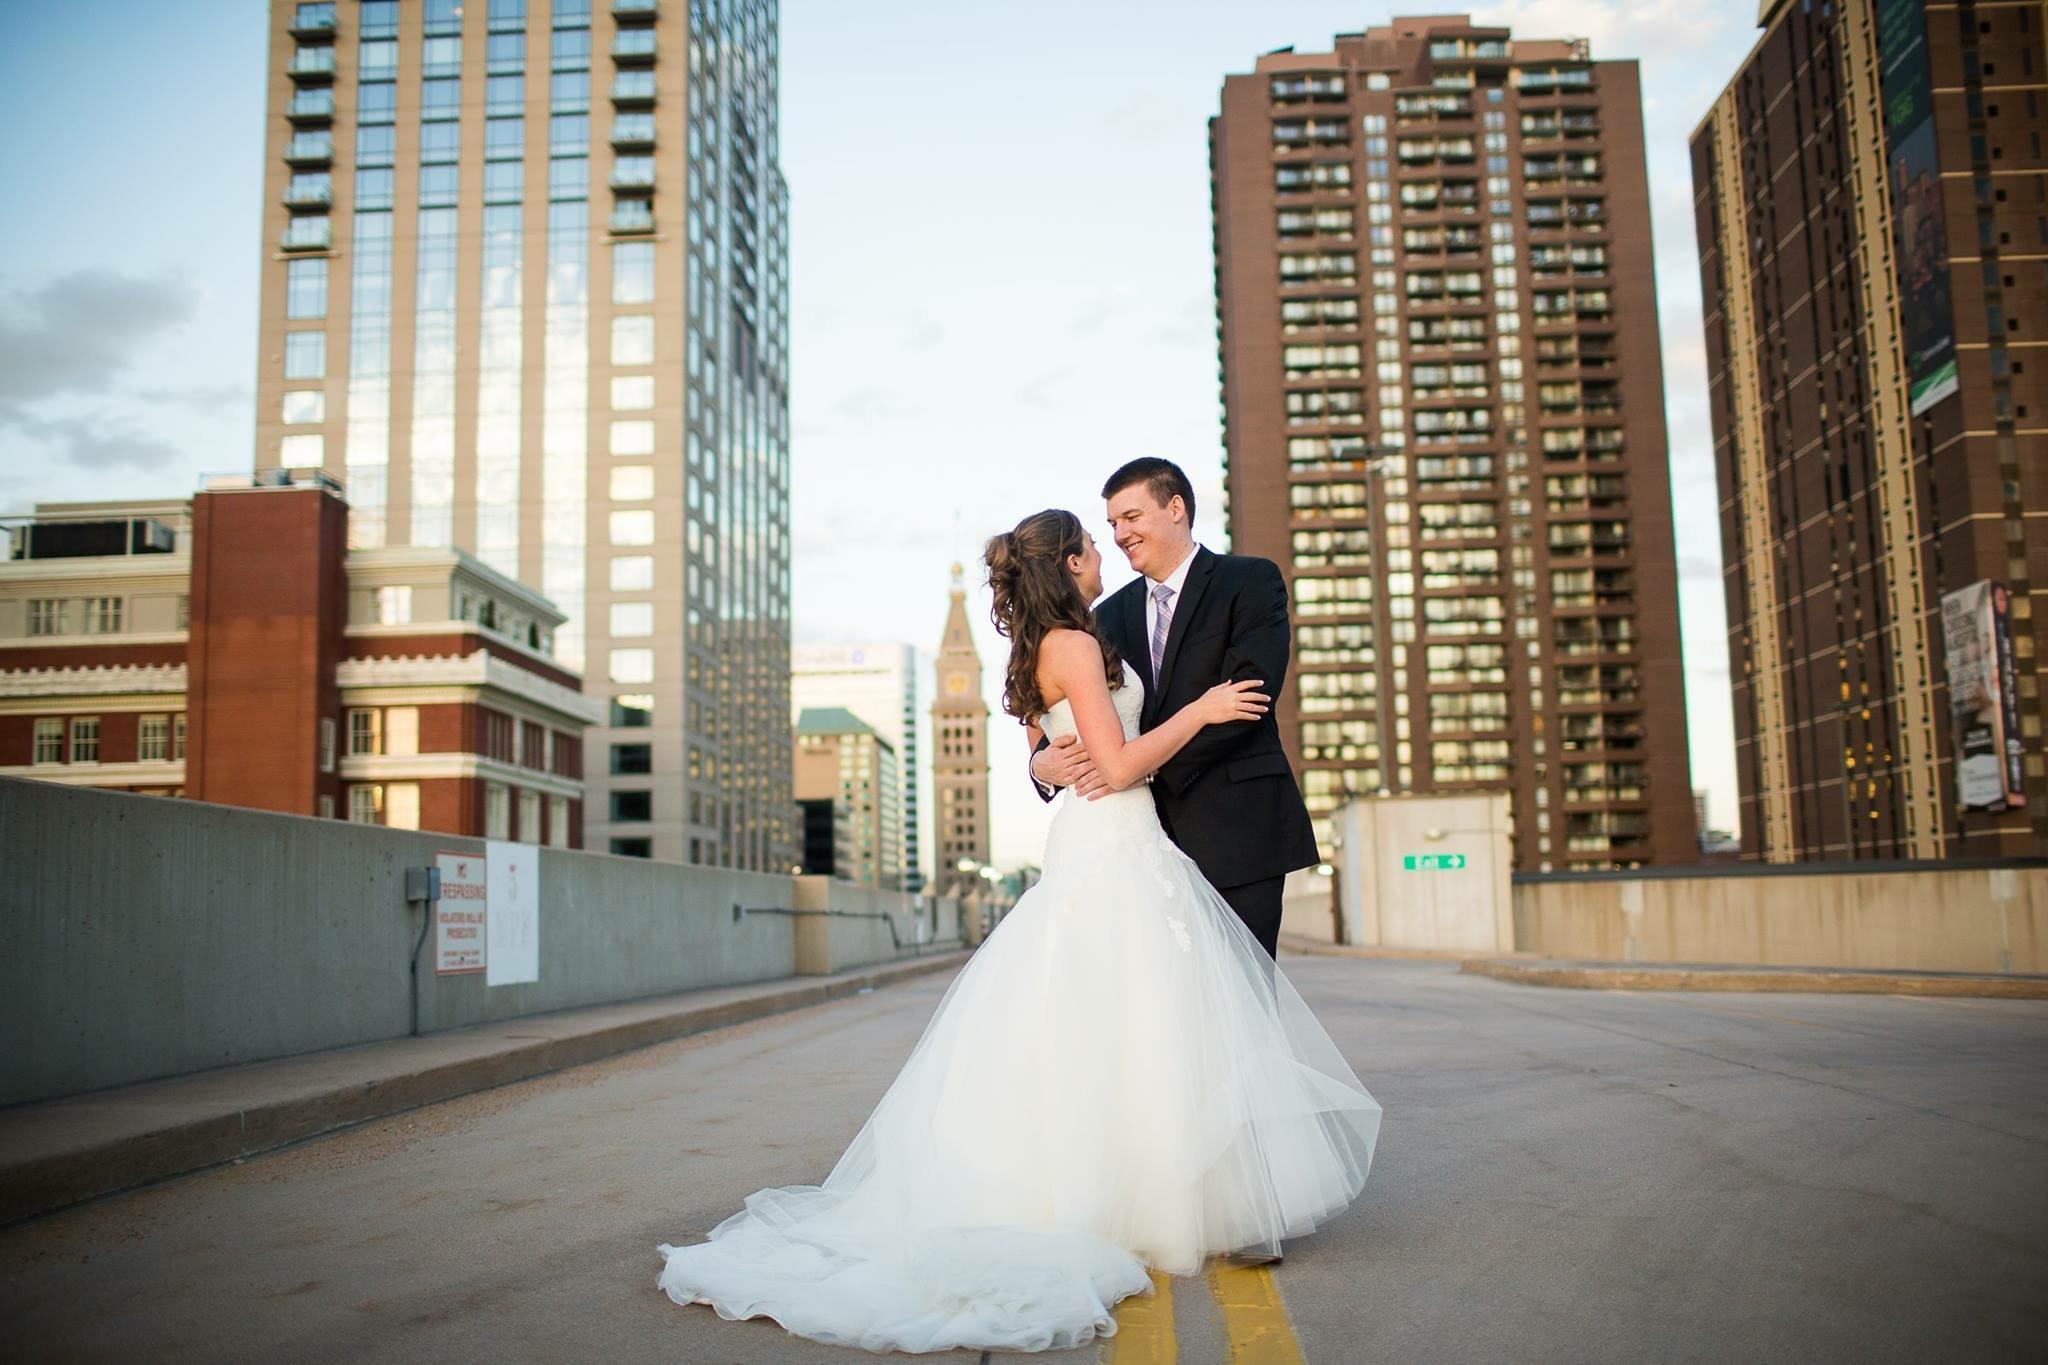 Lyddon Wedding  Denver, CO   Chris Humphreys  |  Chambers Grant Salon at Ellie Caulkins Opera House  |  Kevin Taylor's  |  Cattleya Floral